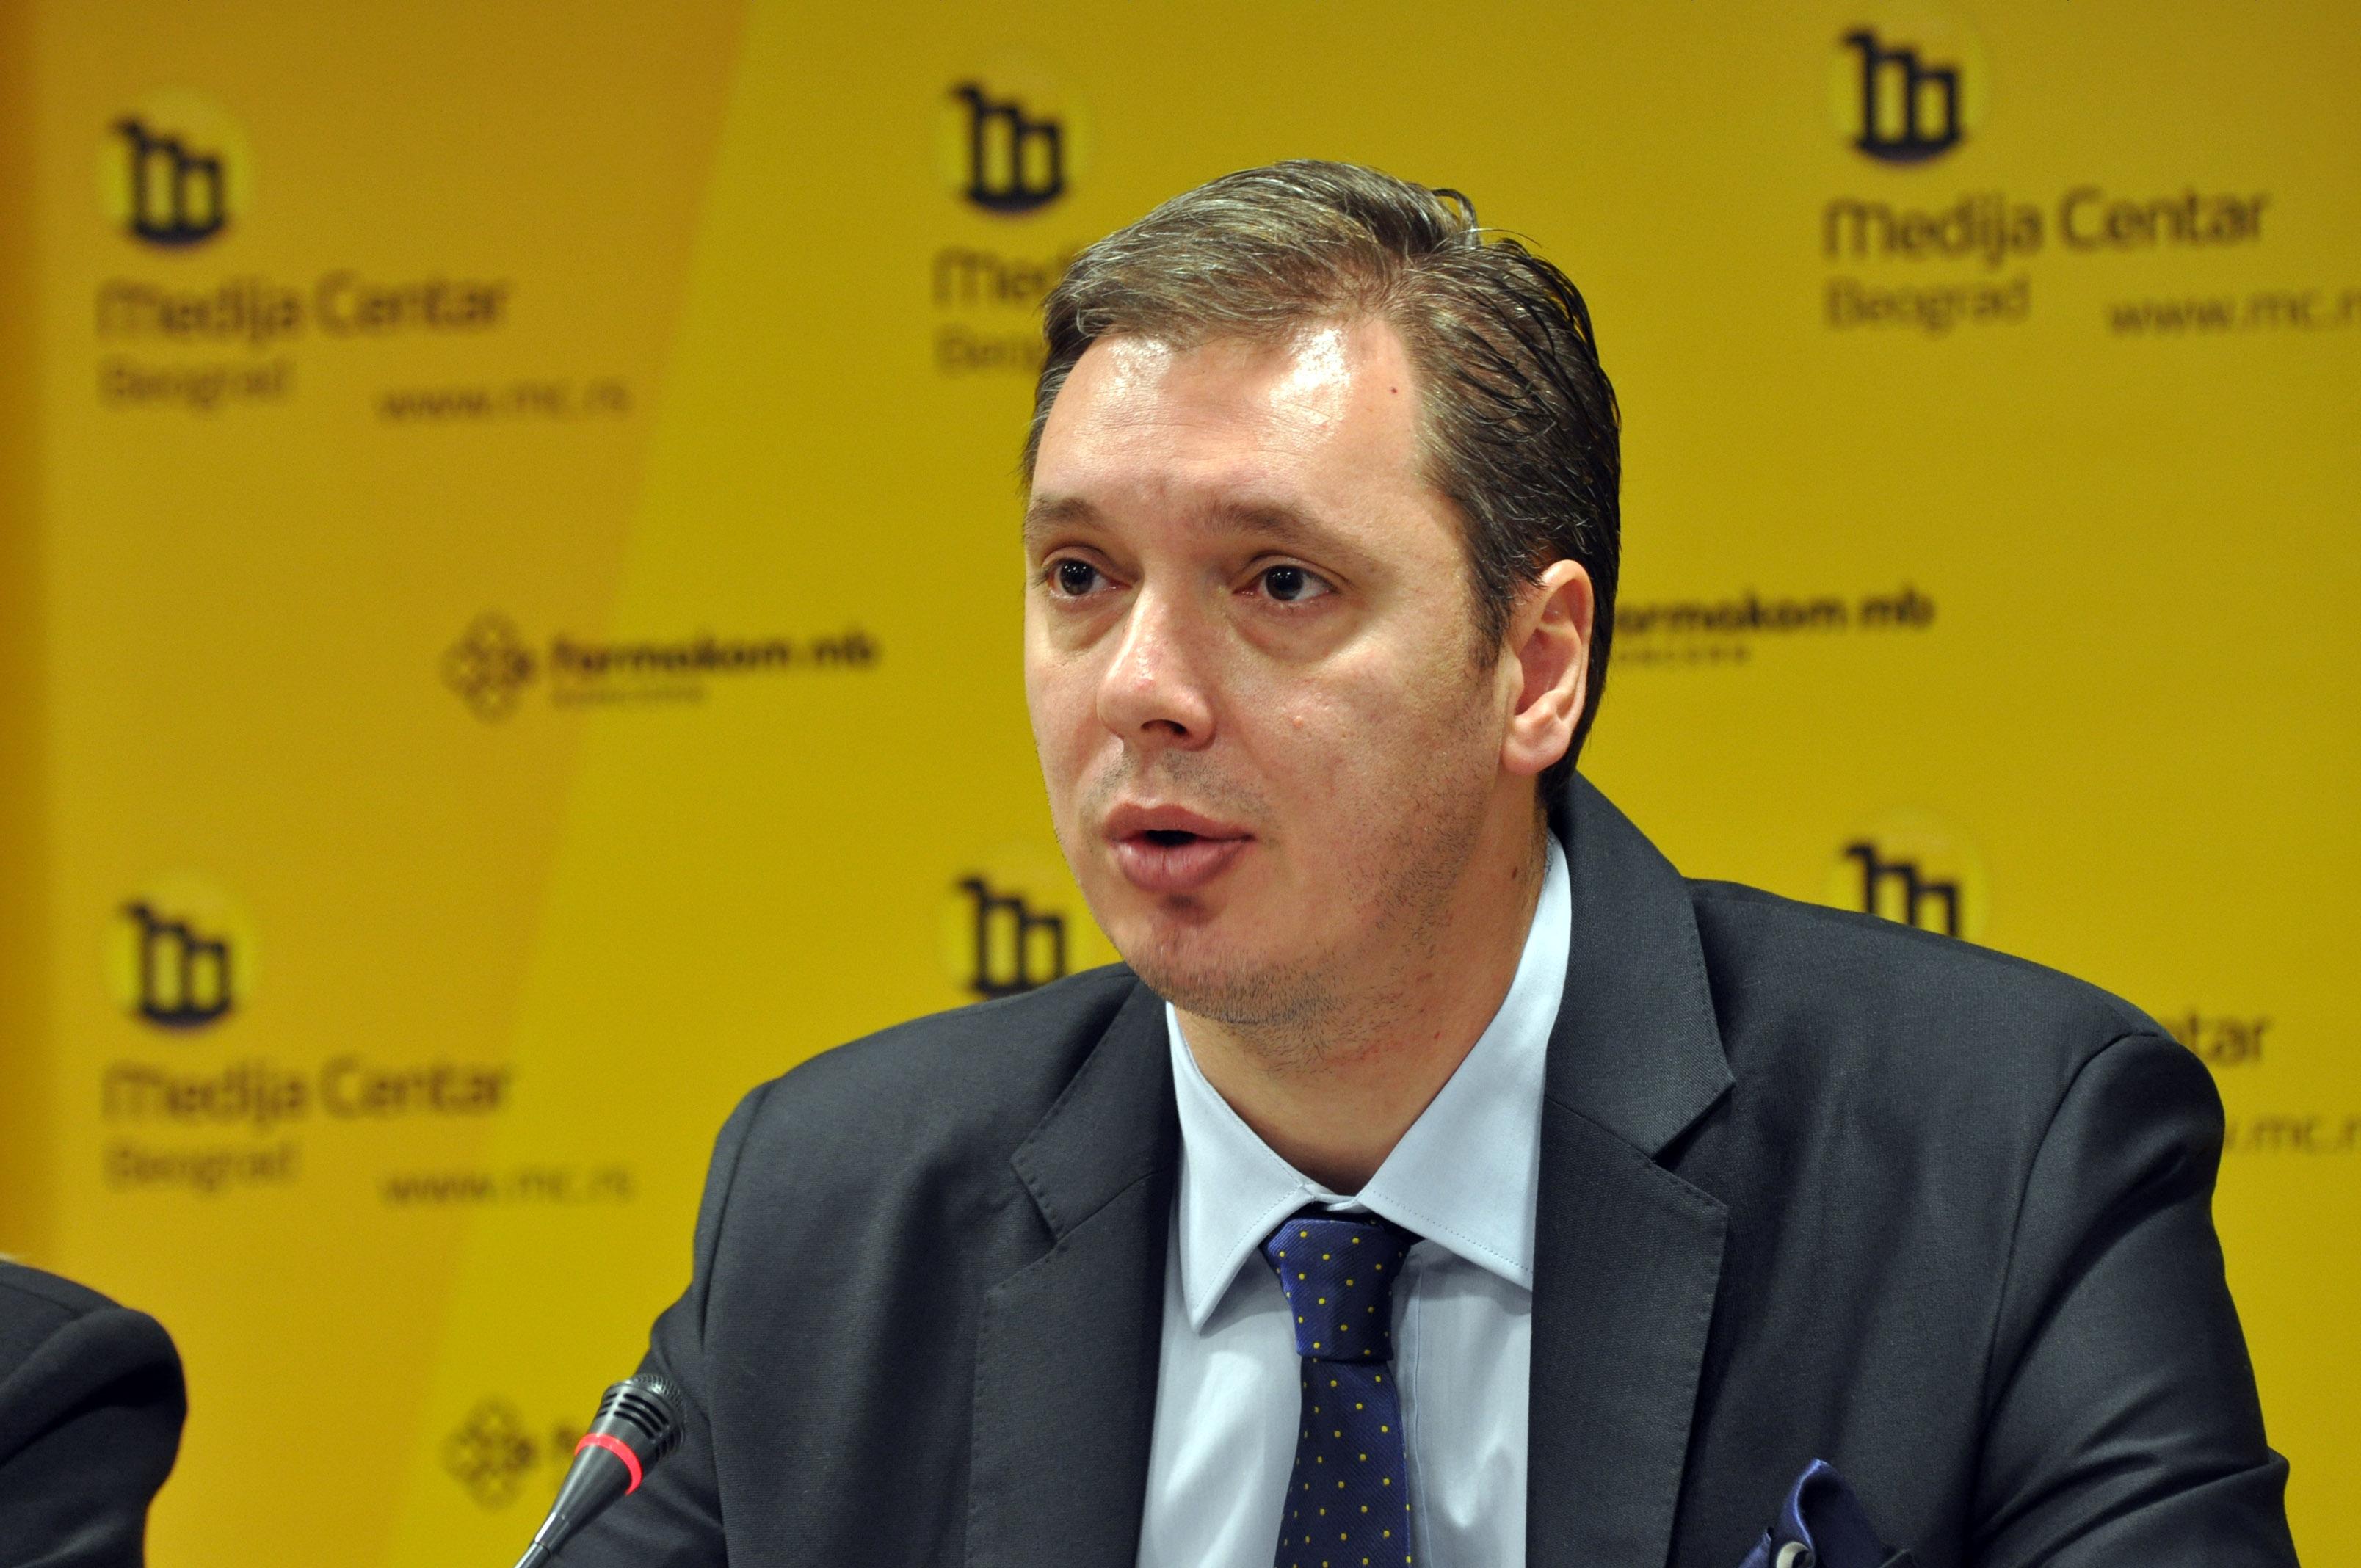 Vucic: Let Serbia rise